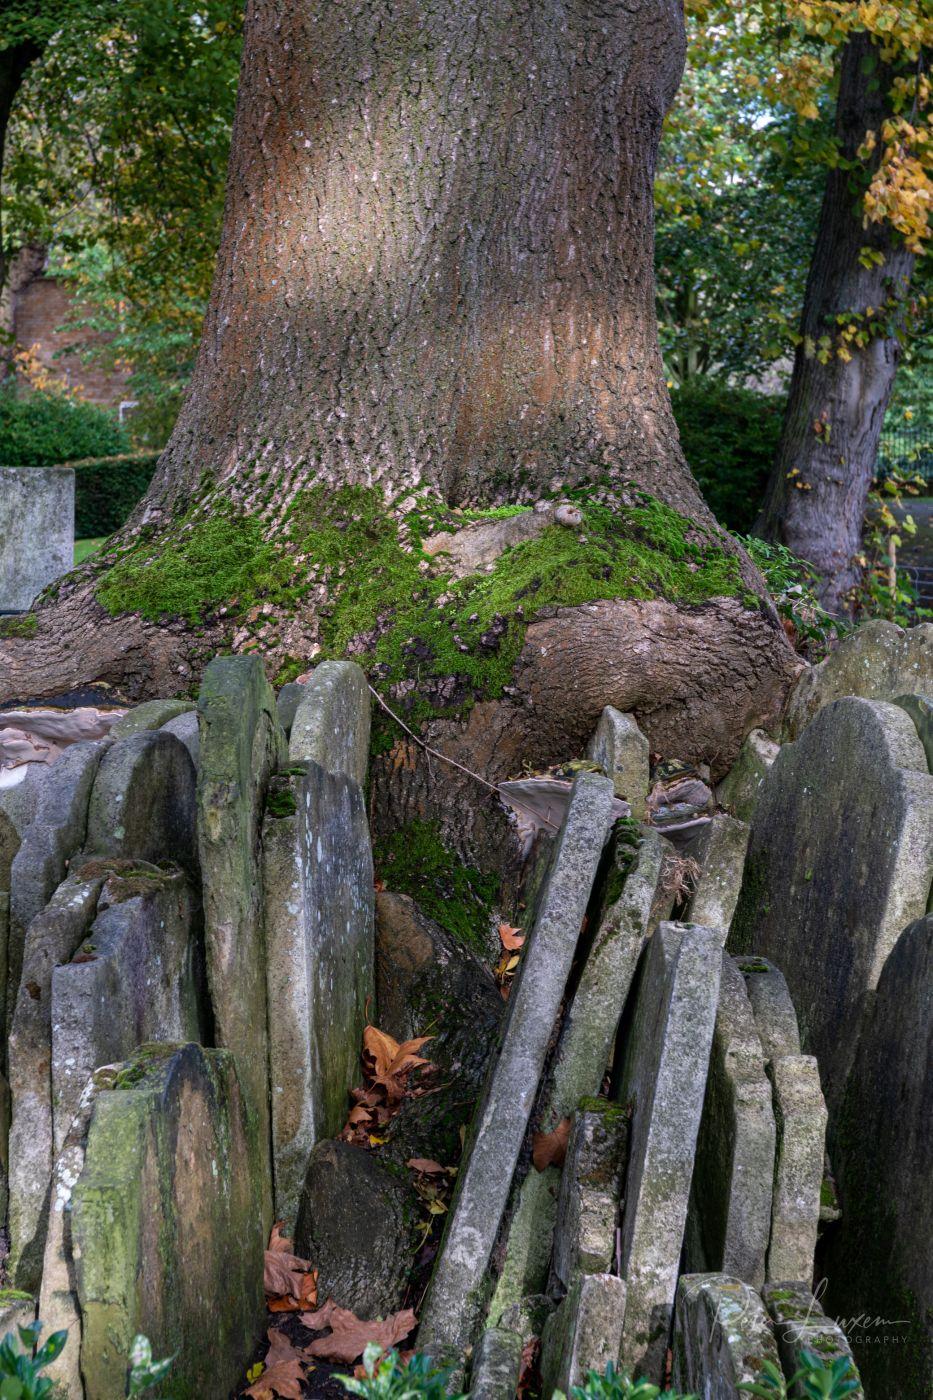 The Hardy Tree, United Kingdom